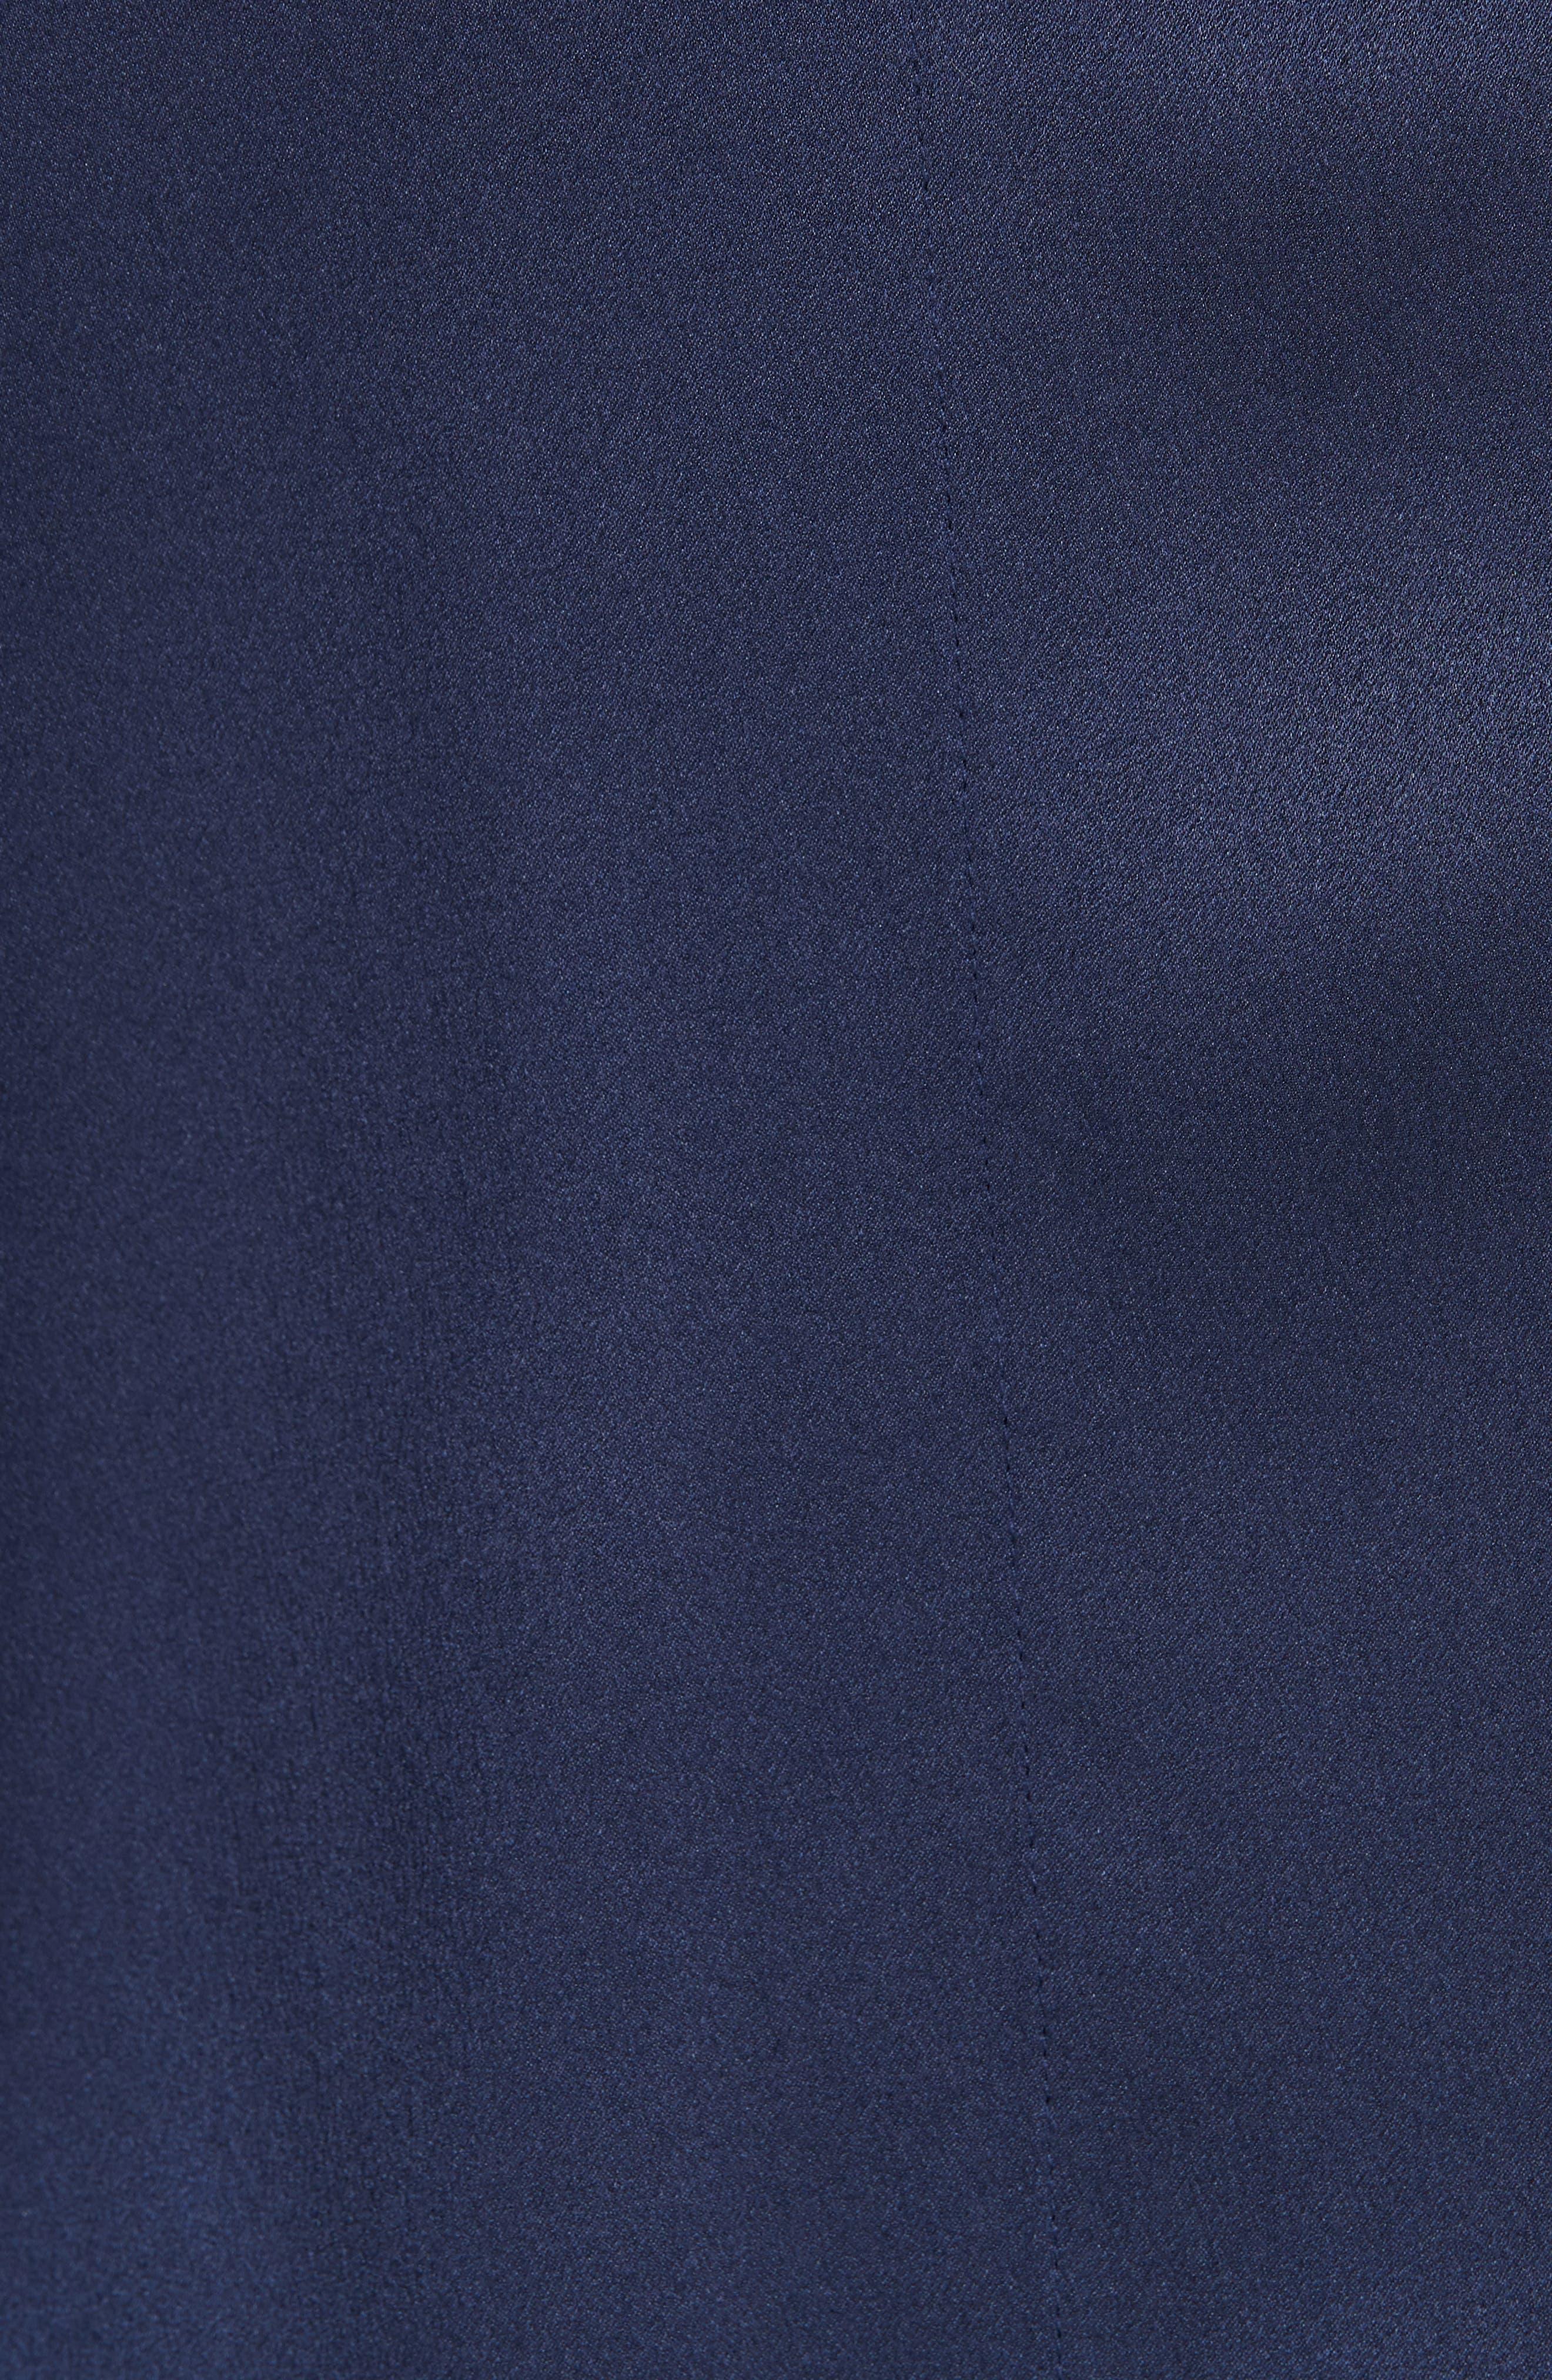 Tie Back Silk Blouse,                             Alternate thumbnail 5, color,                             MARINE